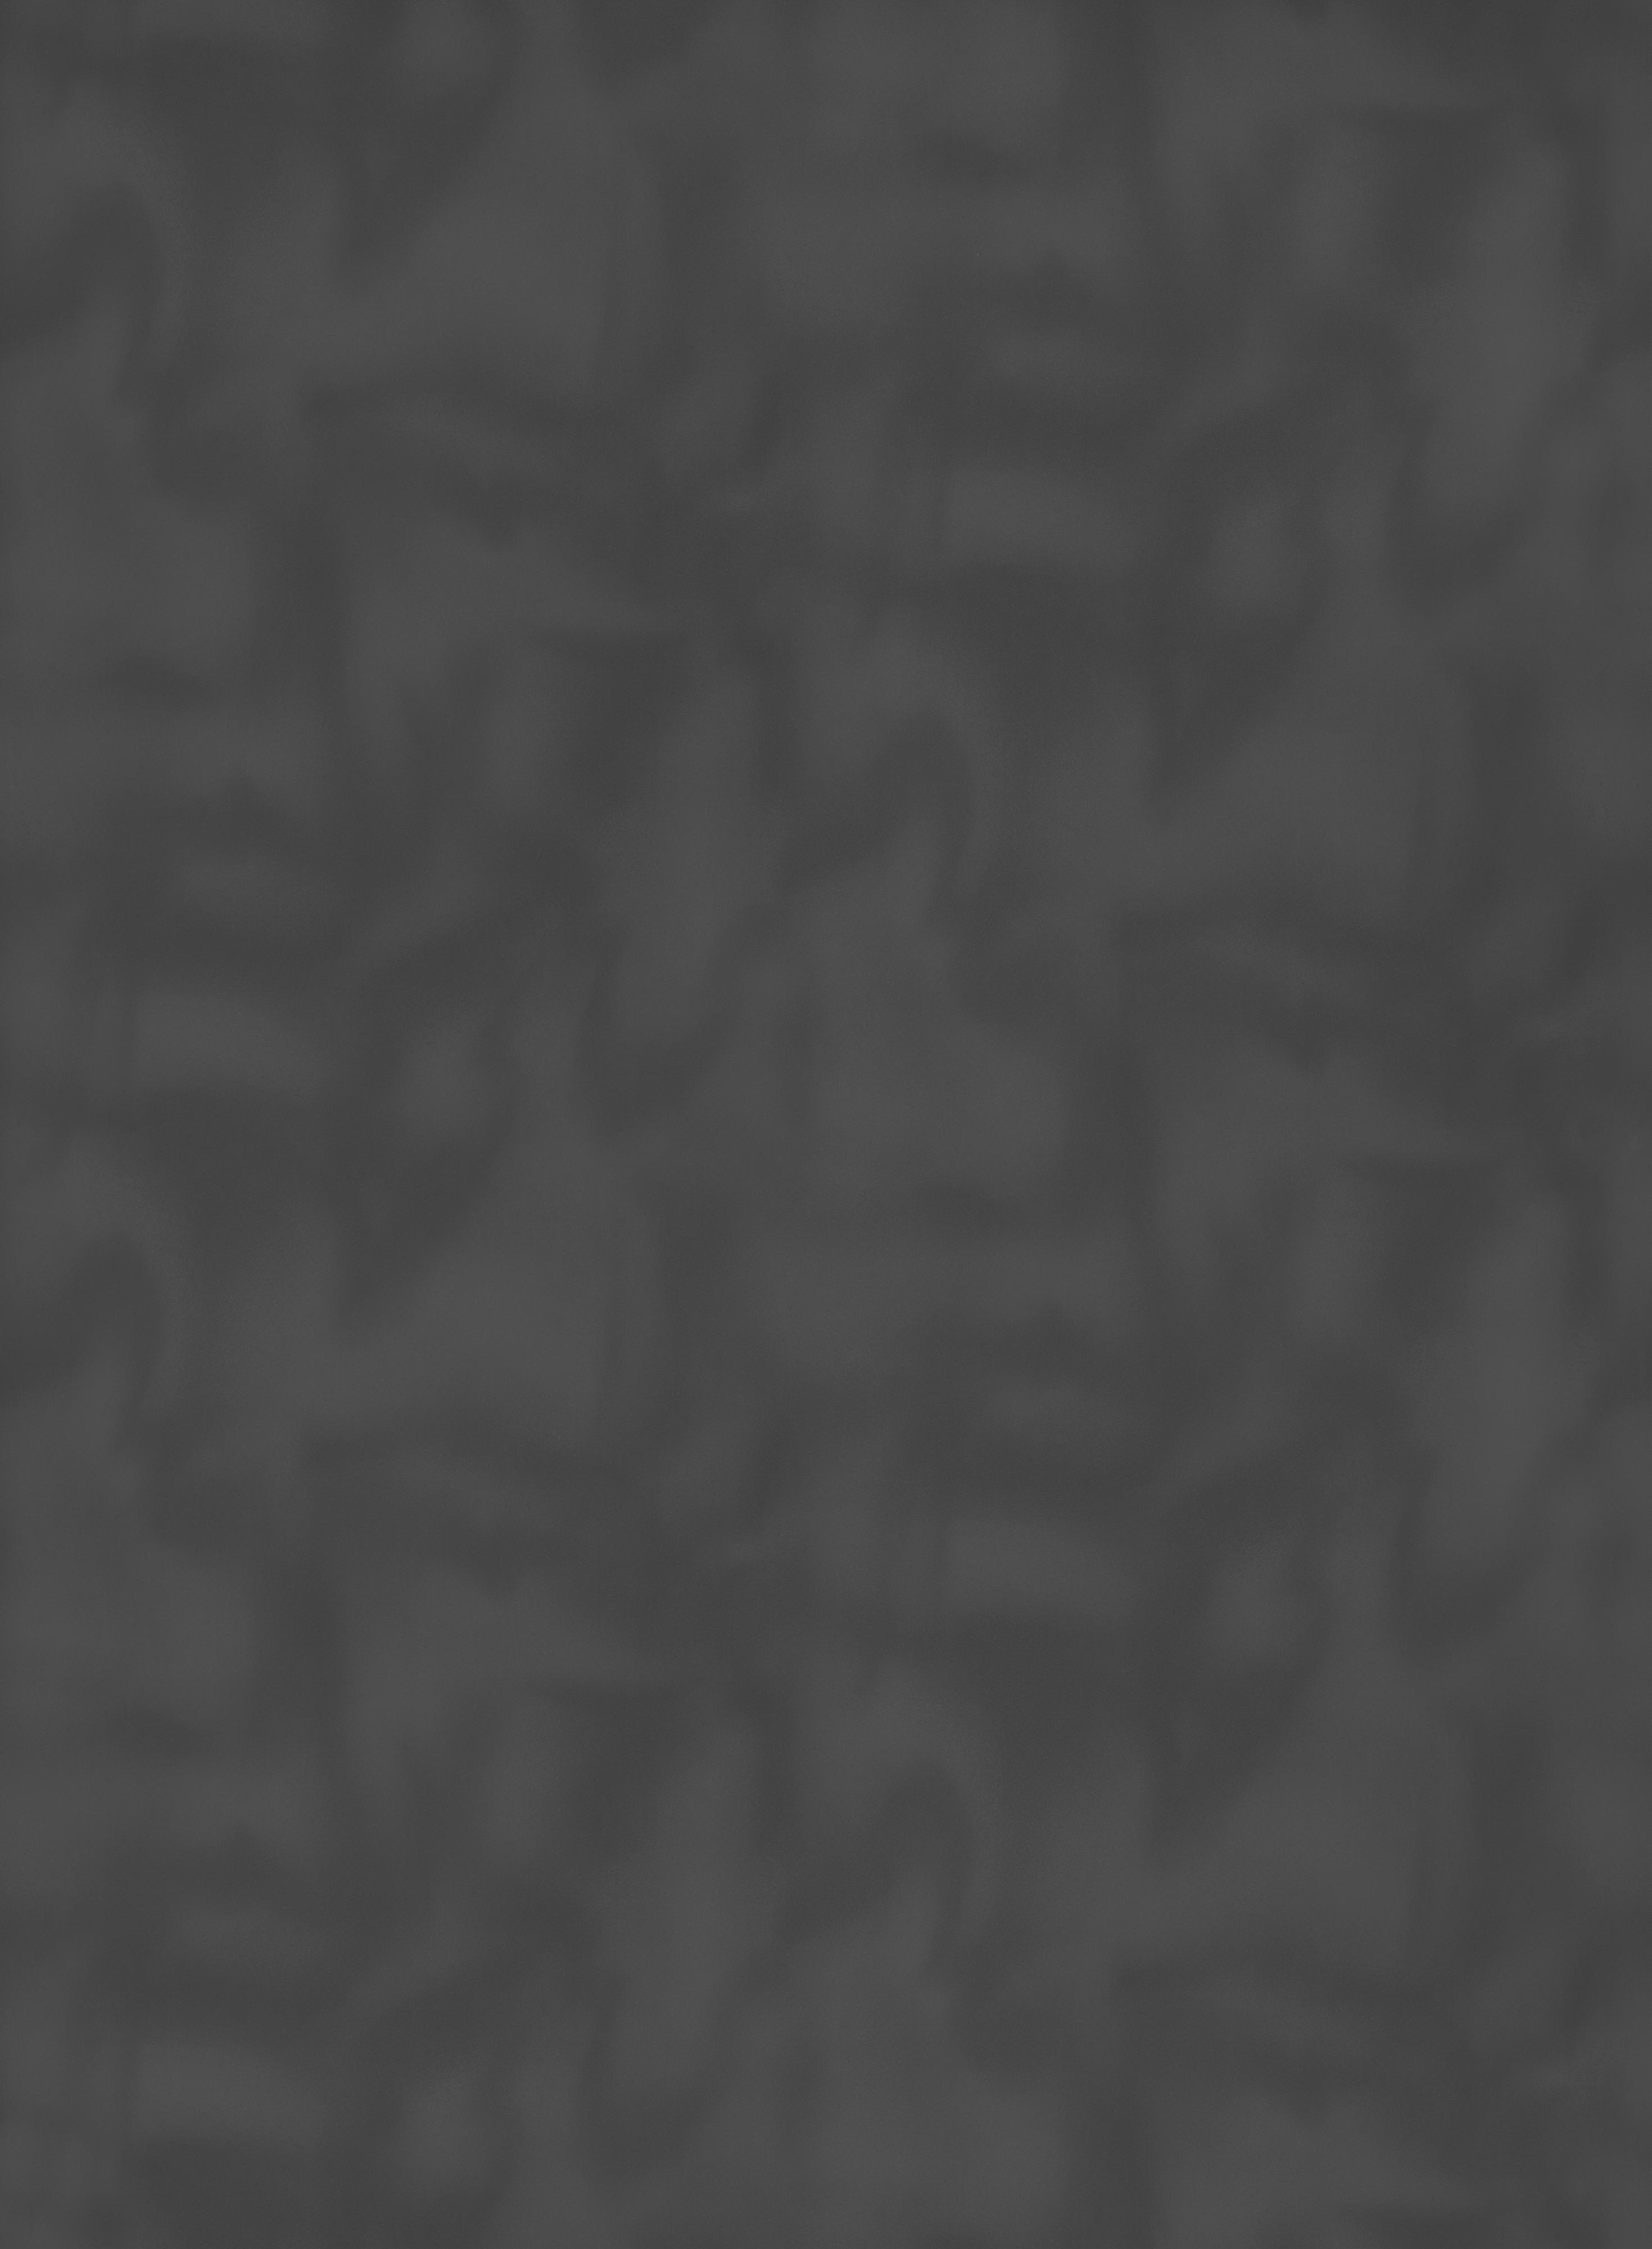 DecoLegno FC54 Lacca - Detail afbeelding